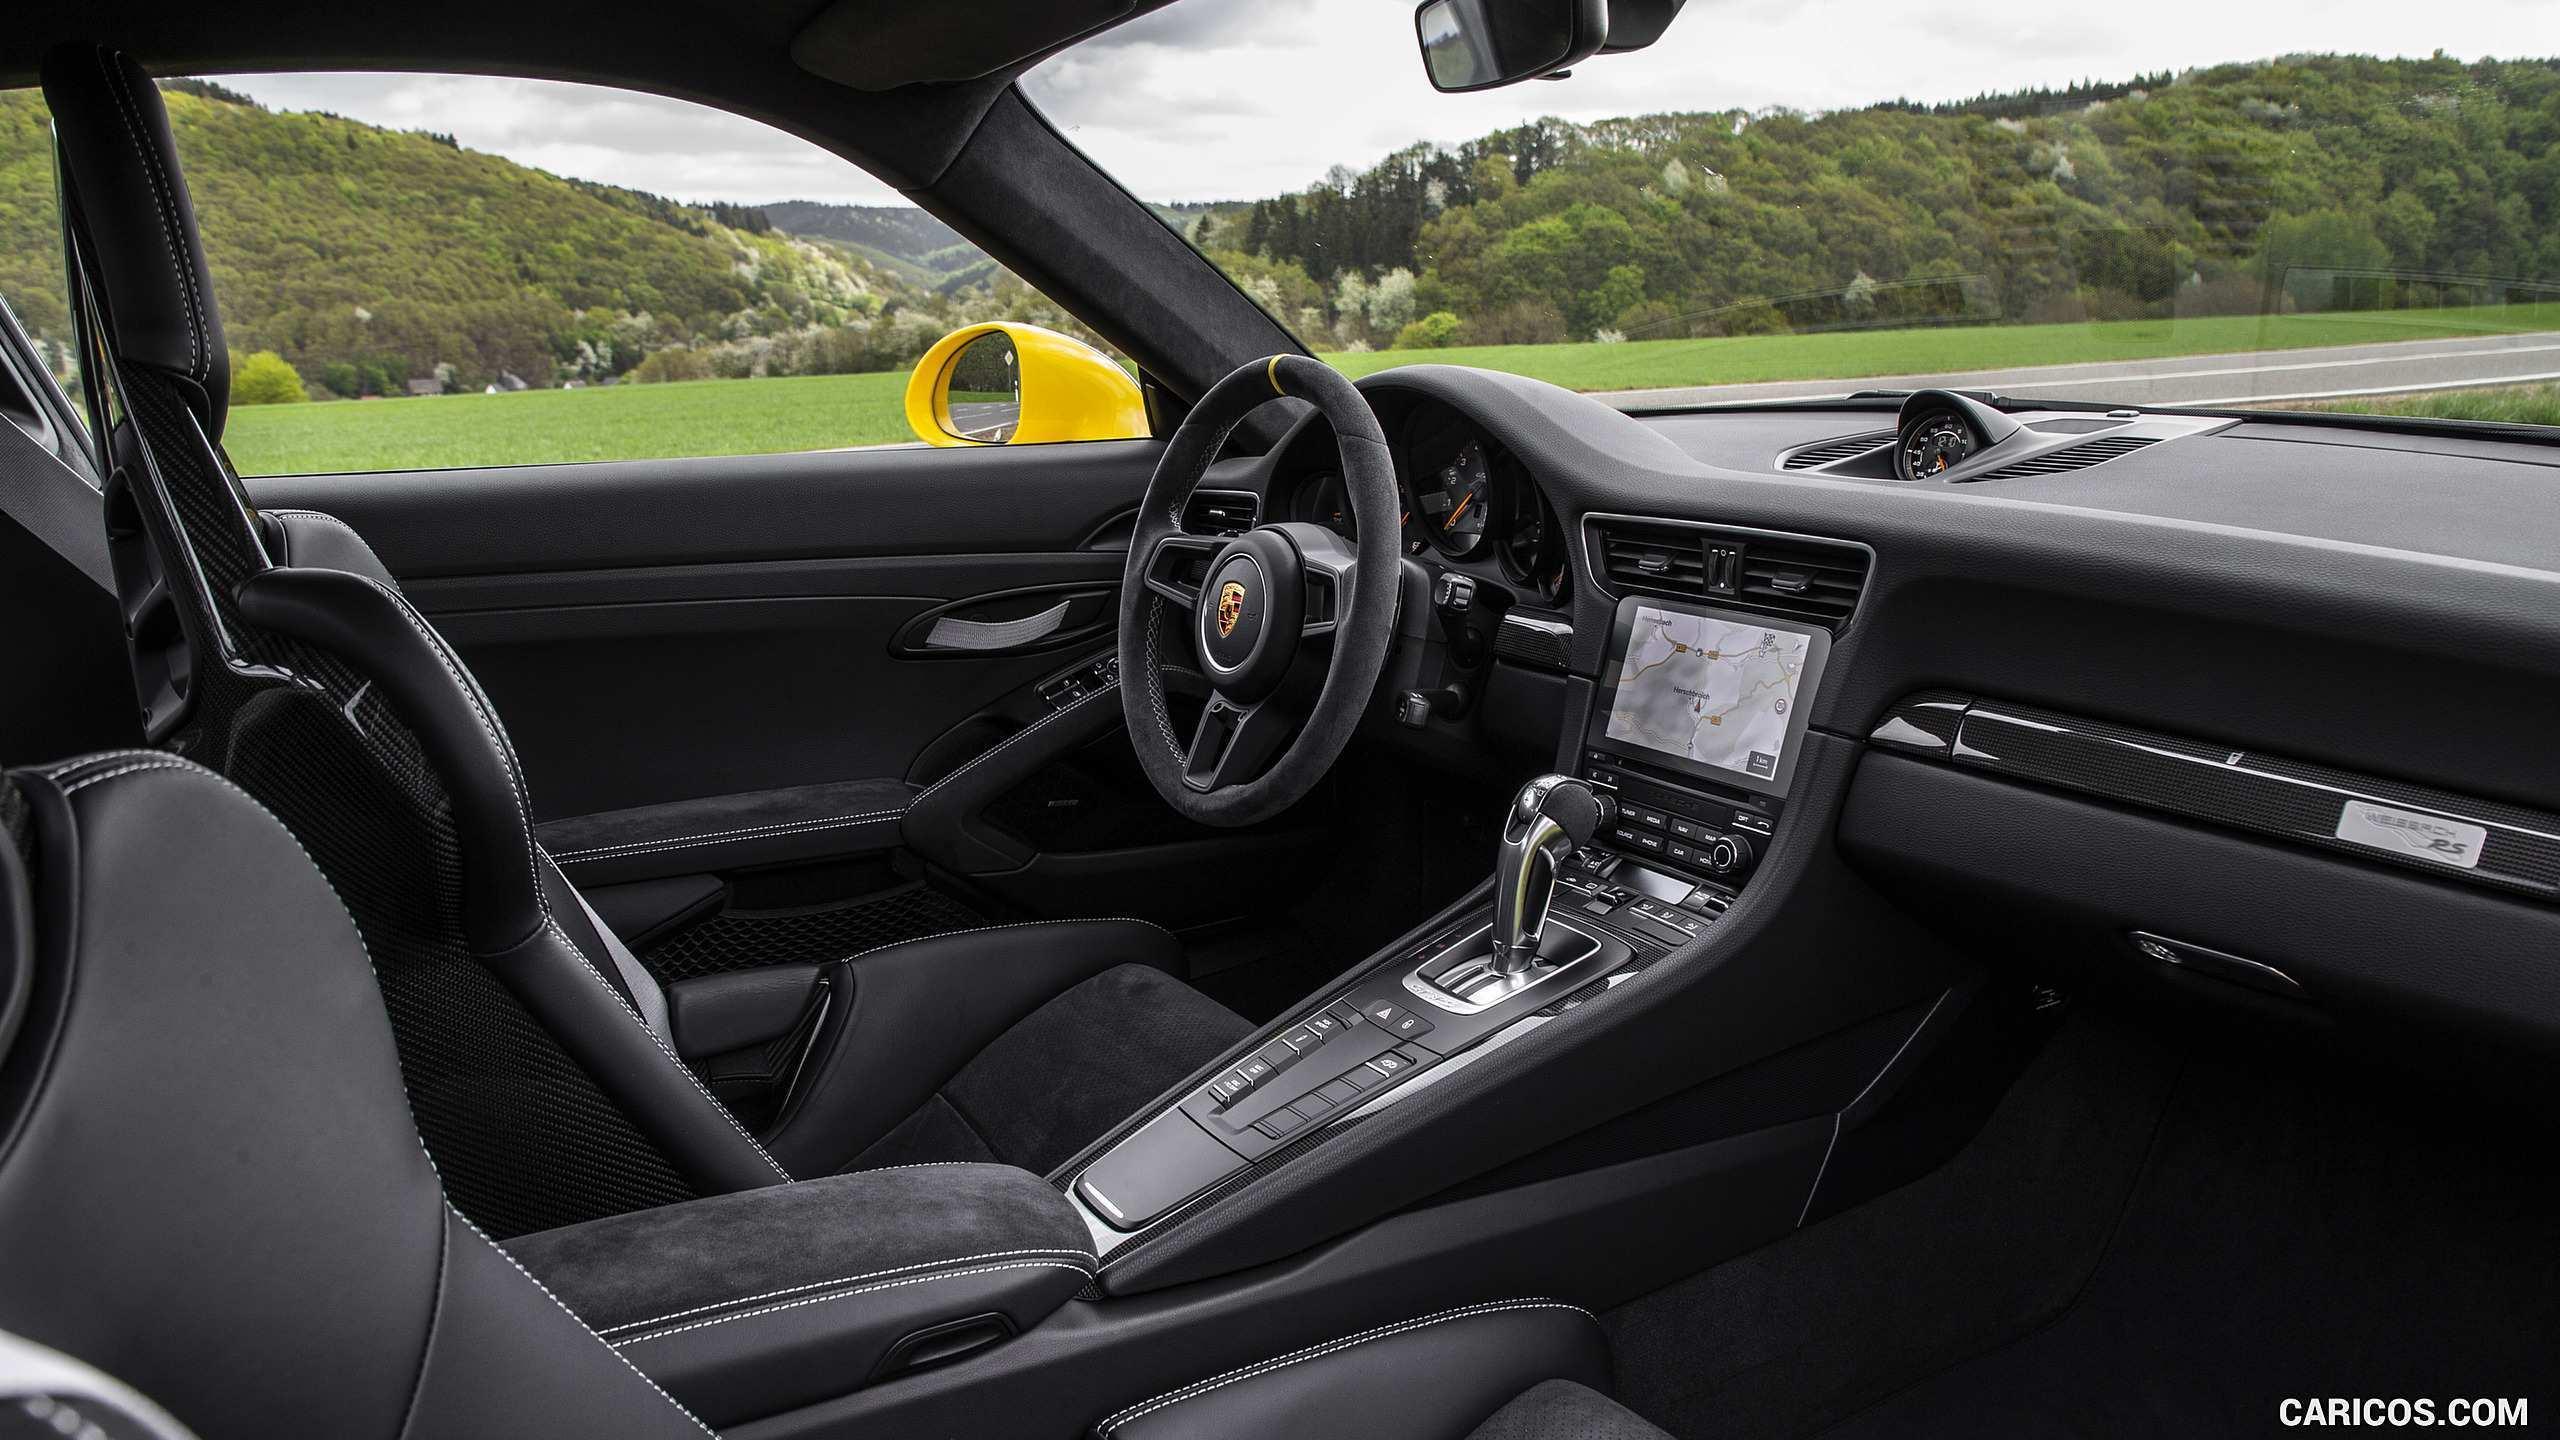 46 New 2019 Porsche Interior Release Date for 2019 Porsche Interior